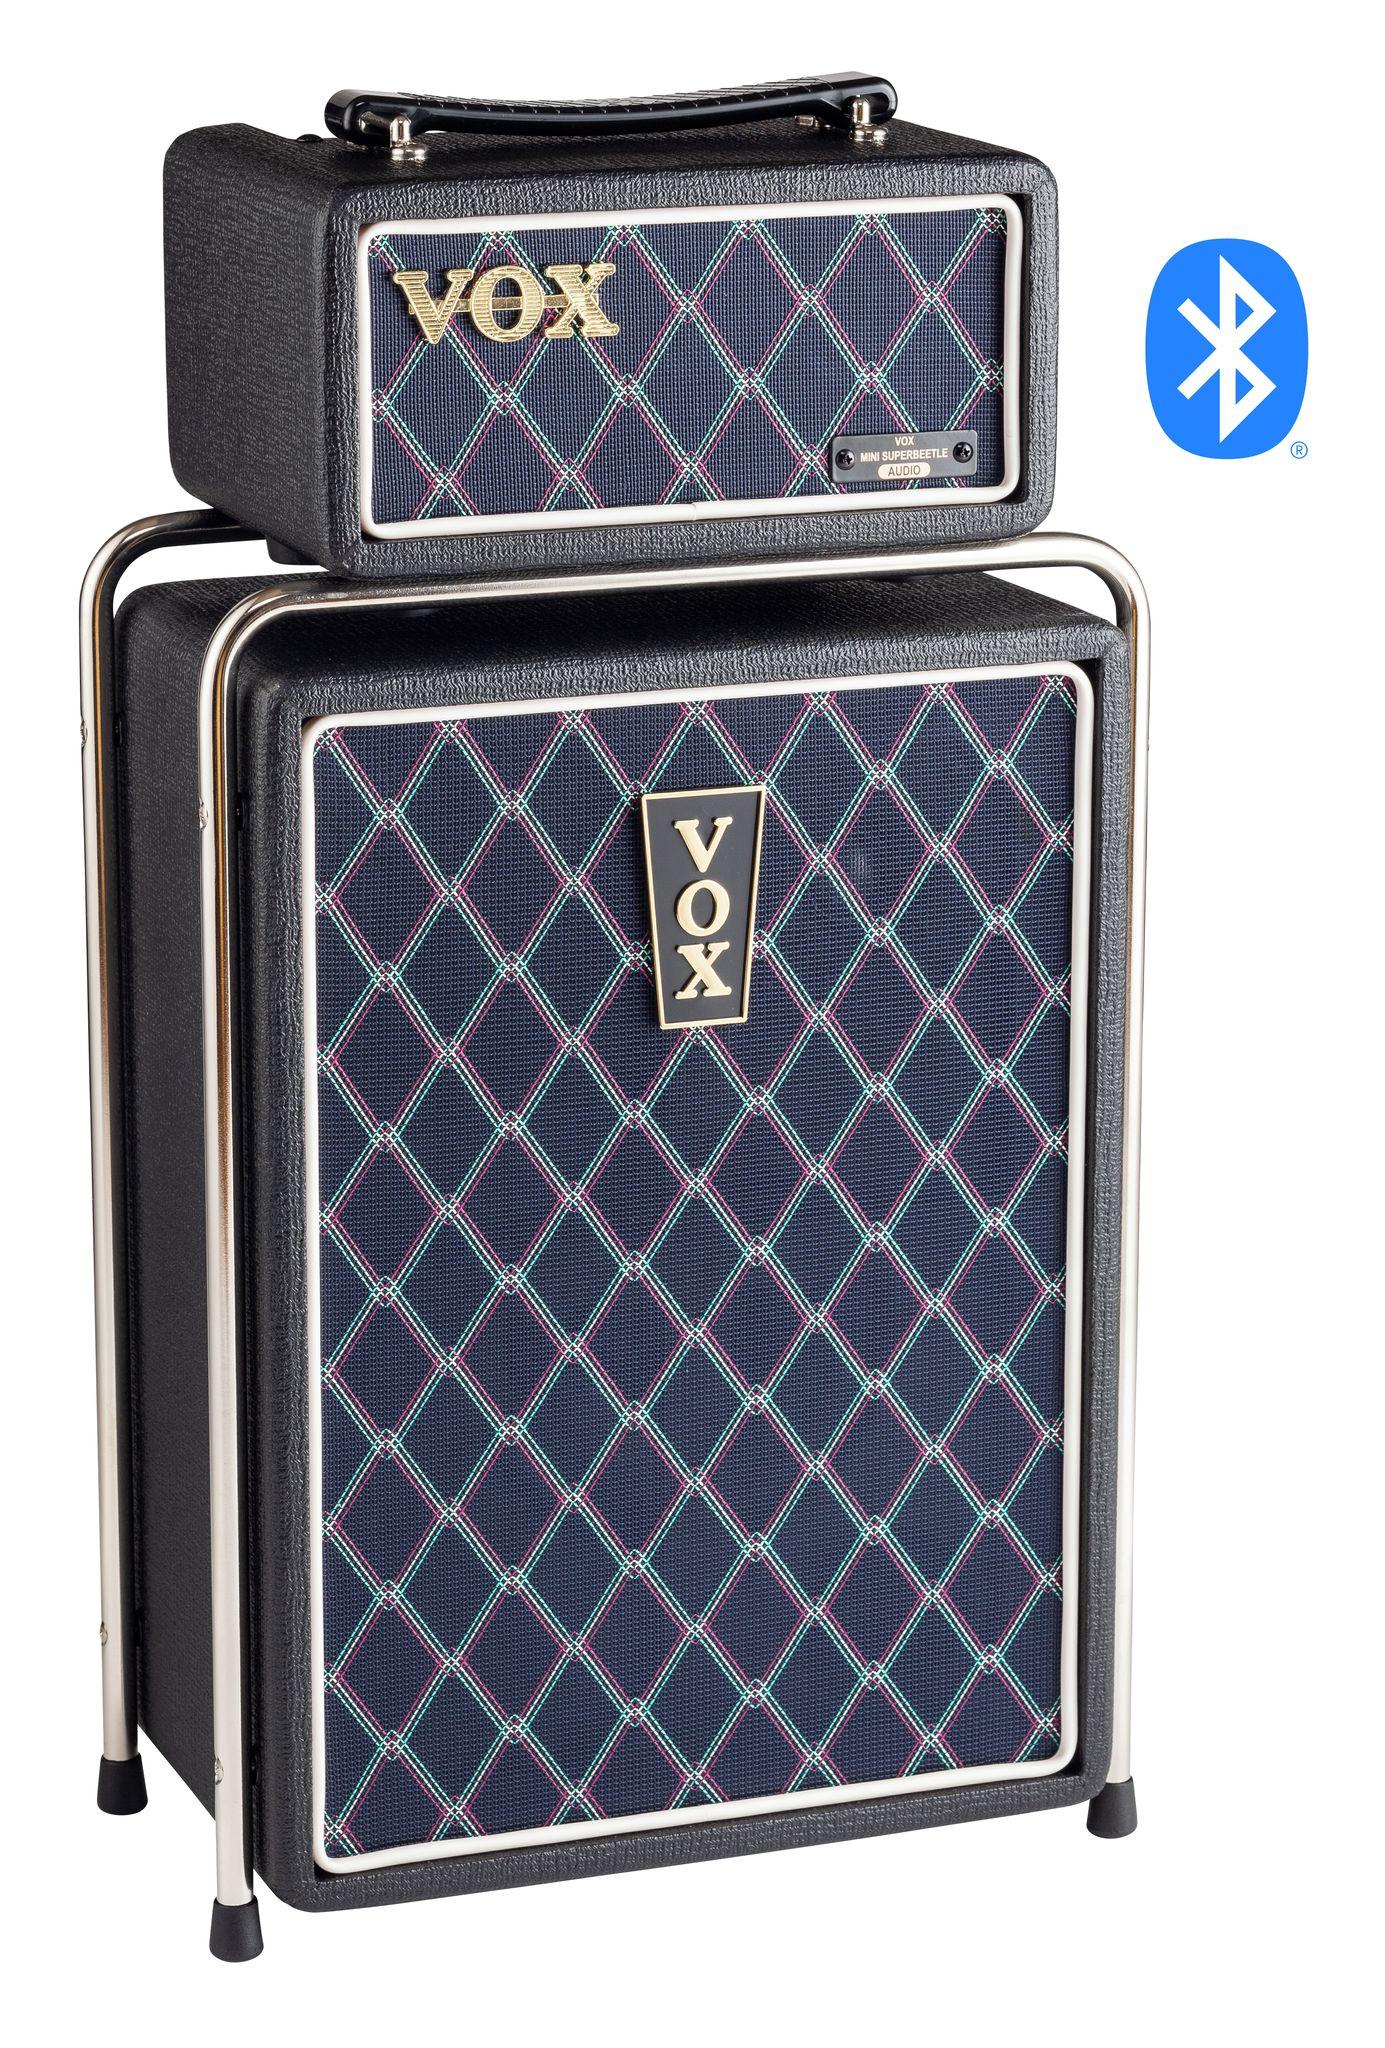 VOX MSB50-AUDIO-BK Bluetooth Speaker, Black